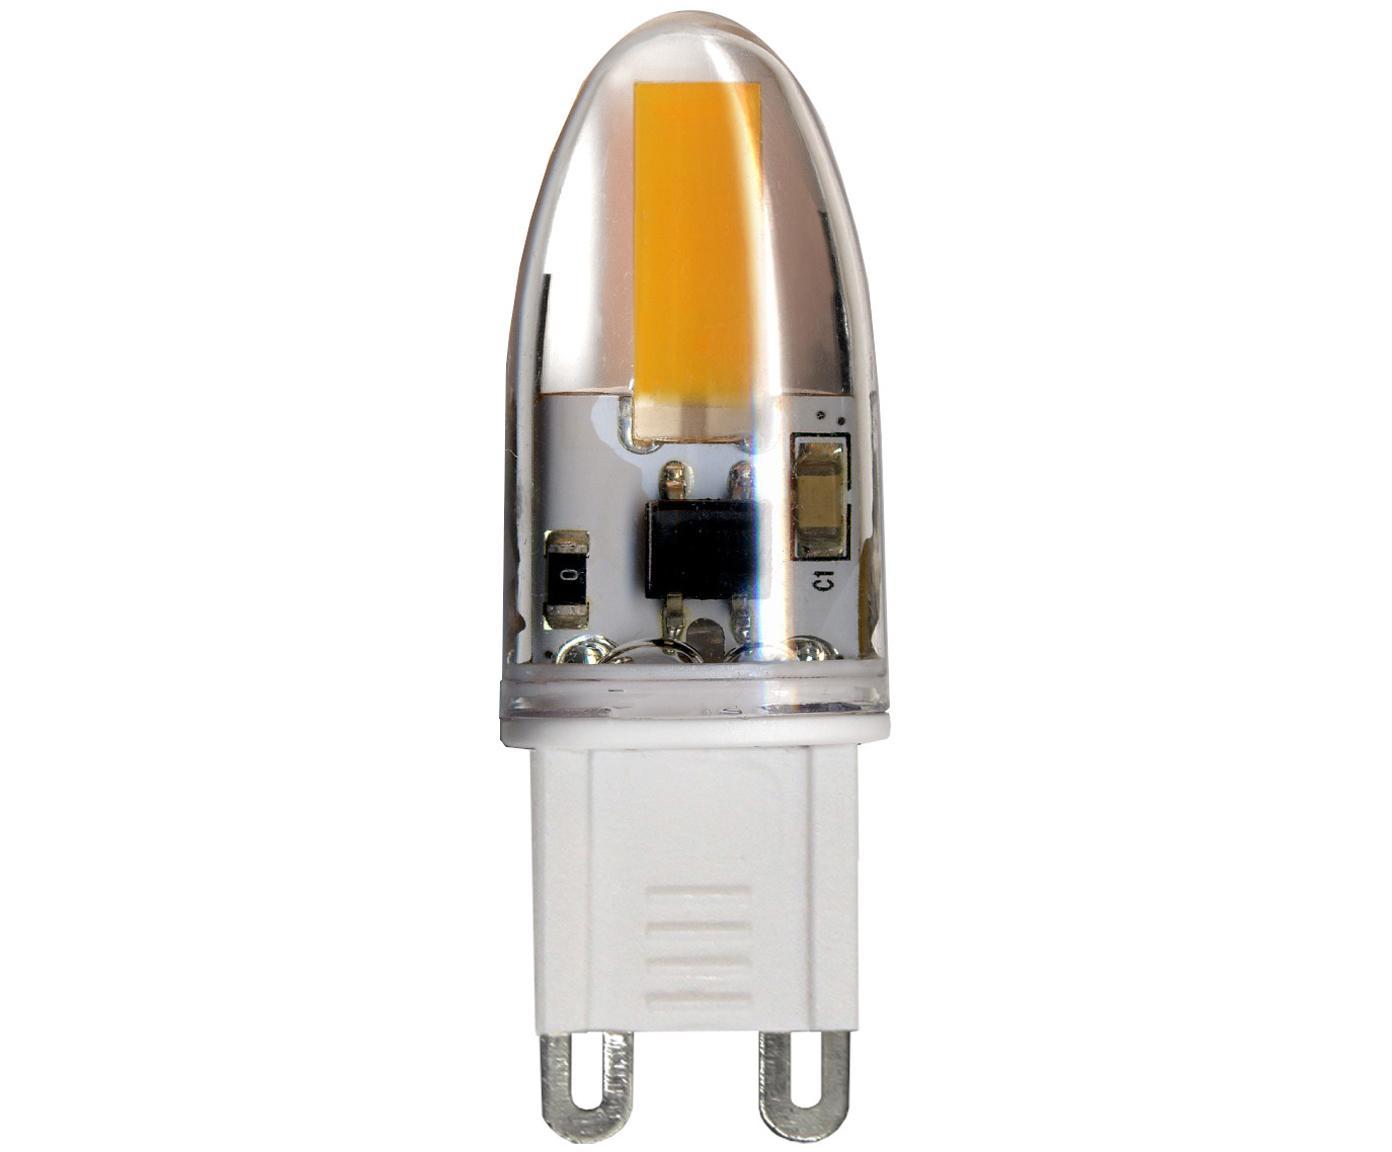 Bombillas LED Halo (G9/1.6W), 5uds., Vidrio, Transparente, An 2 x Al 5 cm